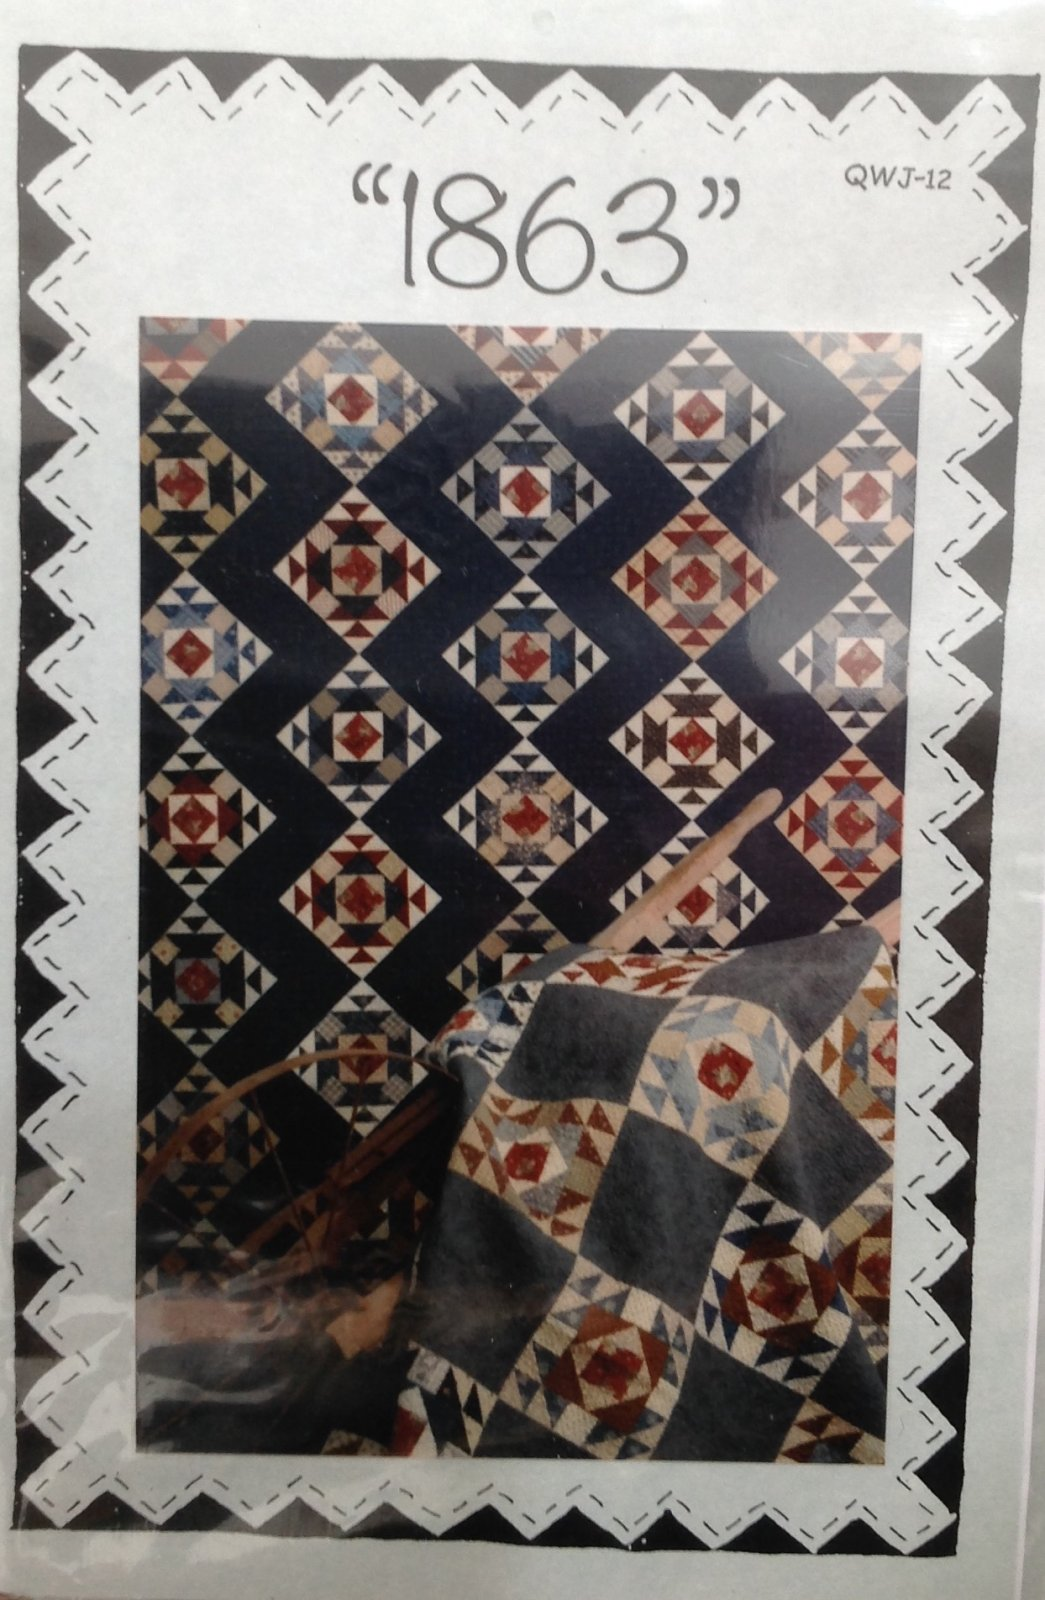 1863 Pattern